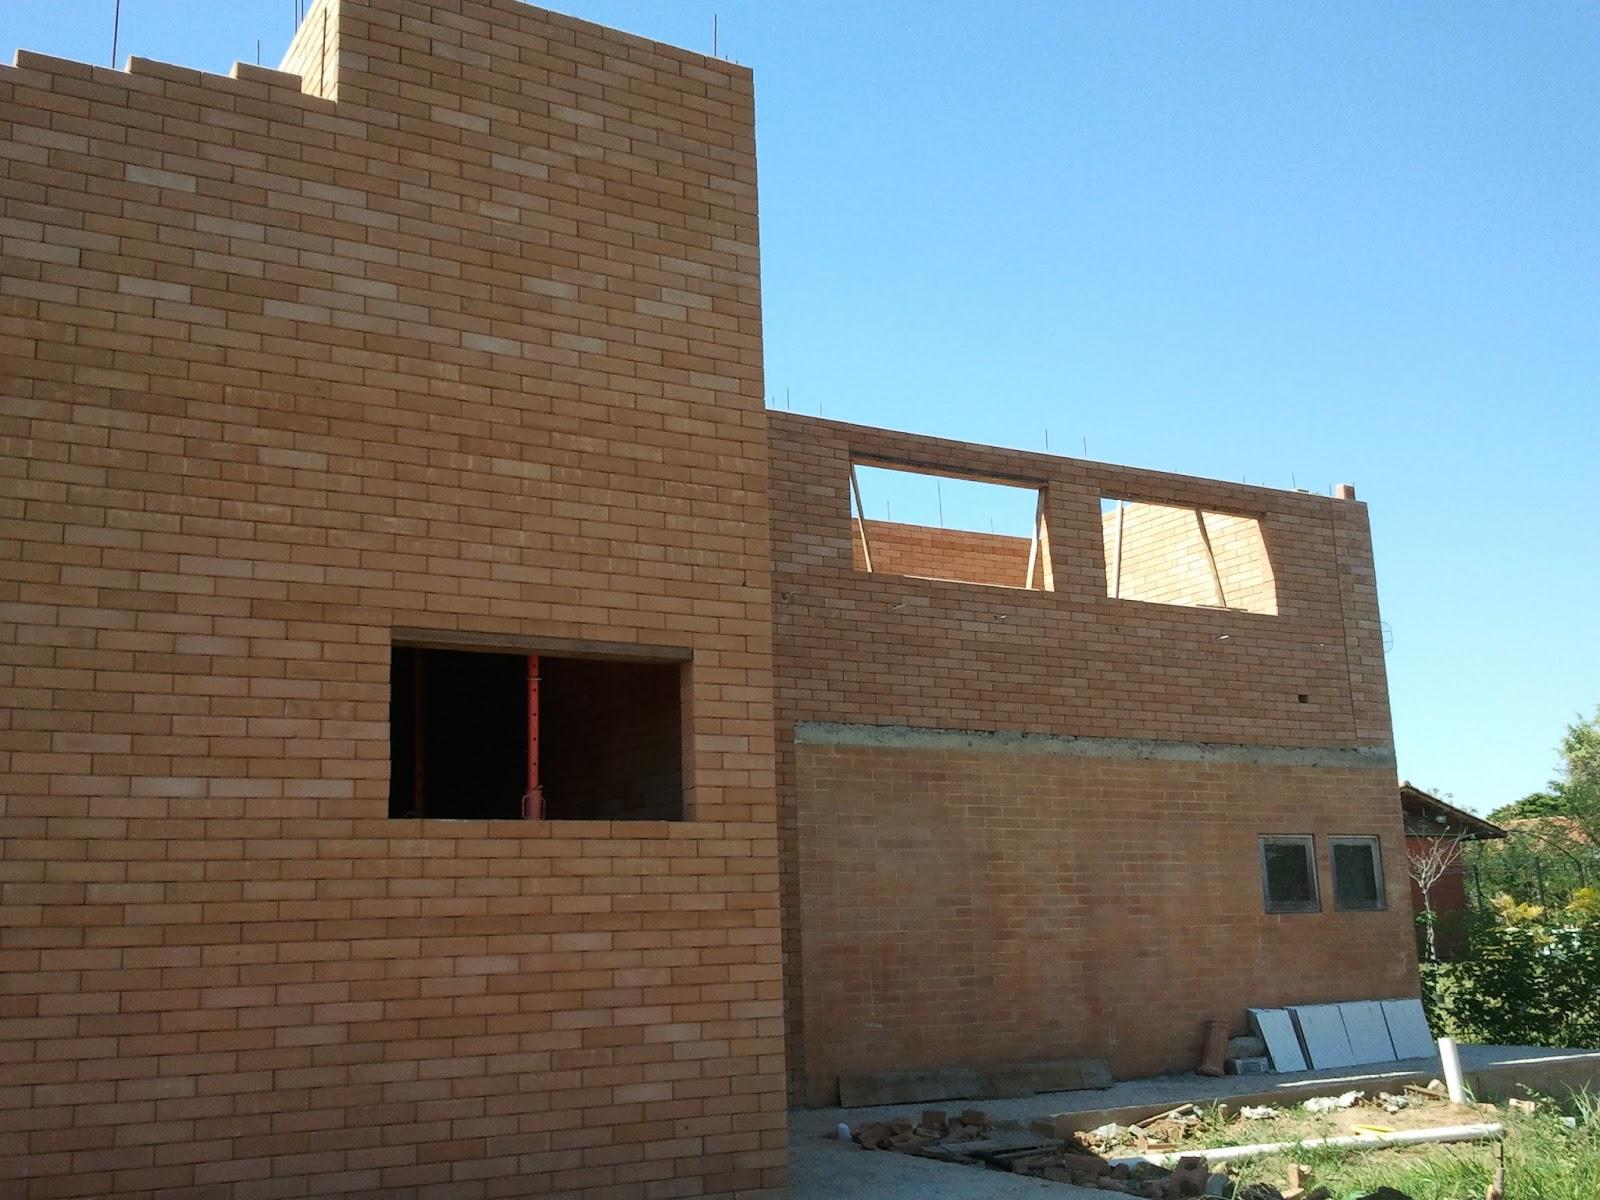 Construindo e Ampliando com Tijolo Solo cimento / Ecológico: Agosto  #0776C4 1600x1200 Banheiro Com Tijolo Ecologico